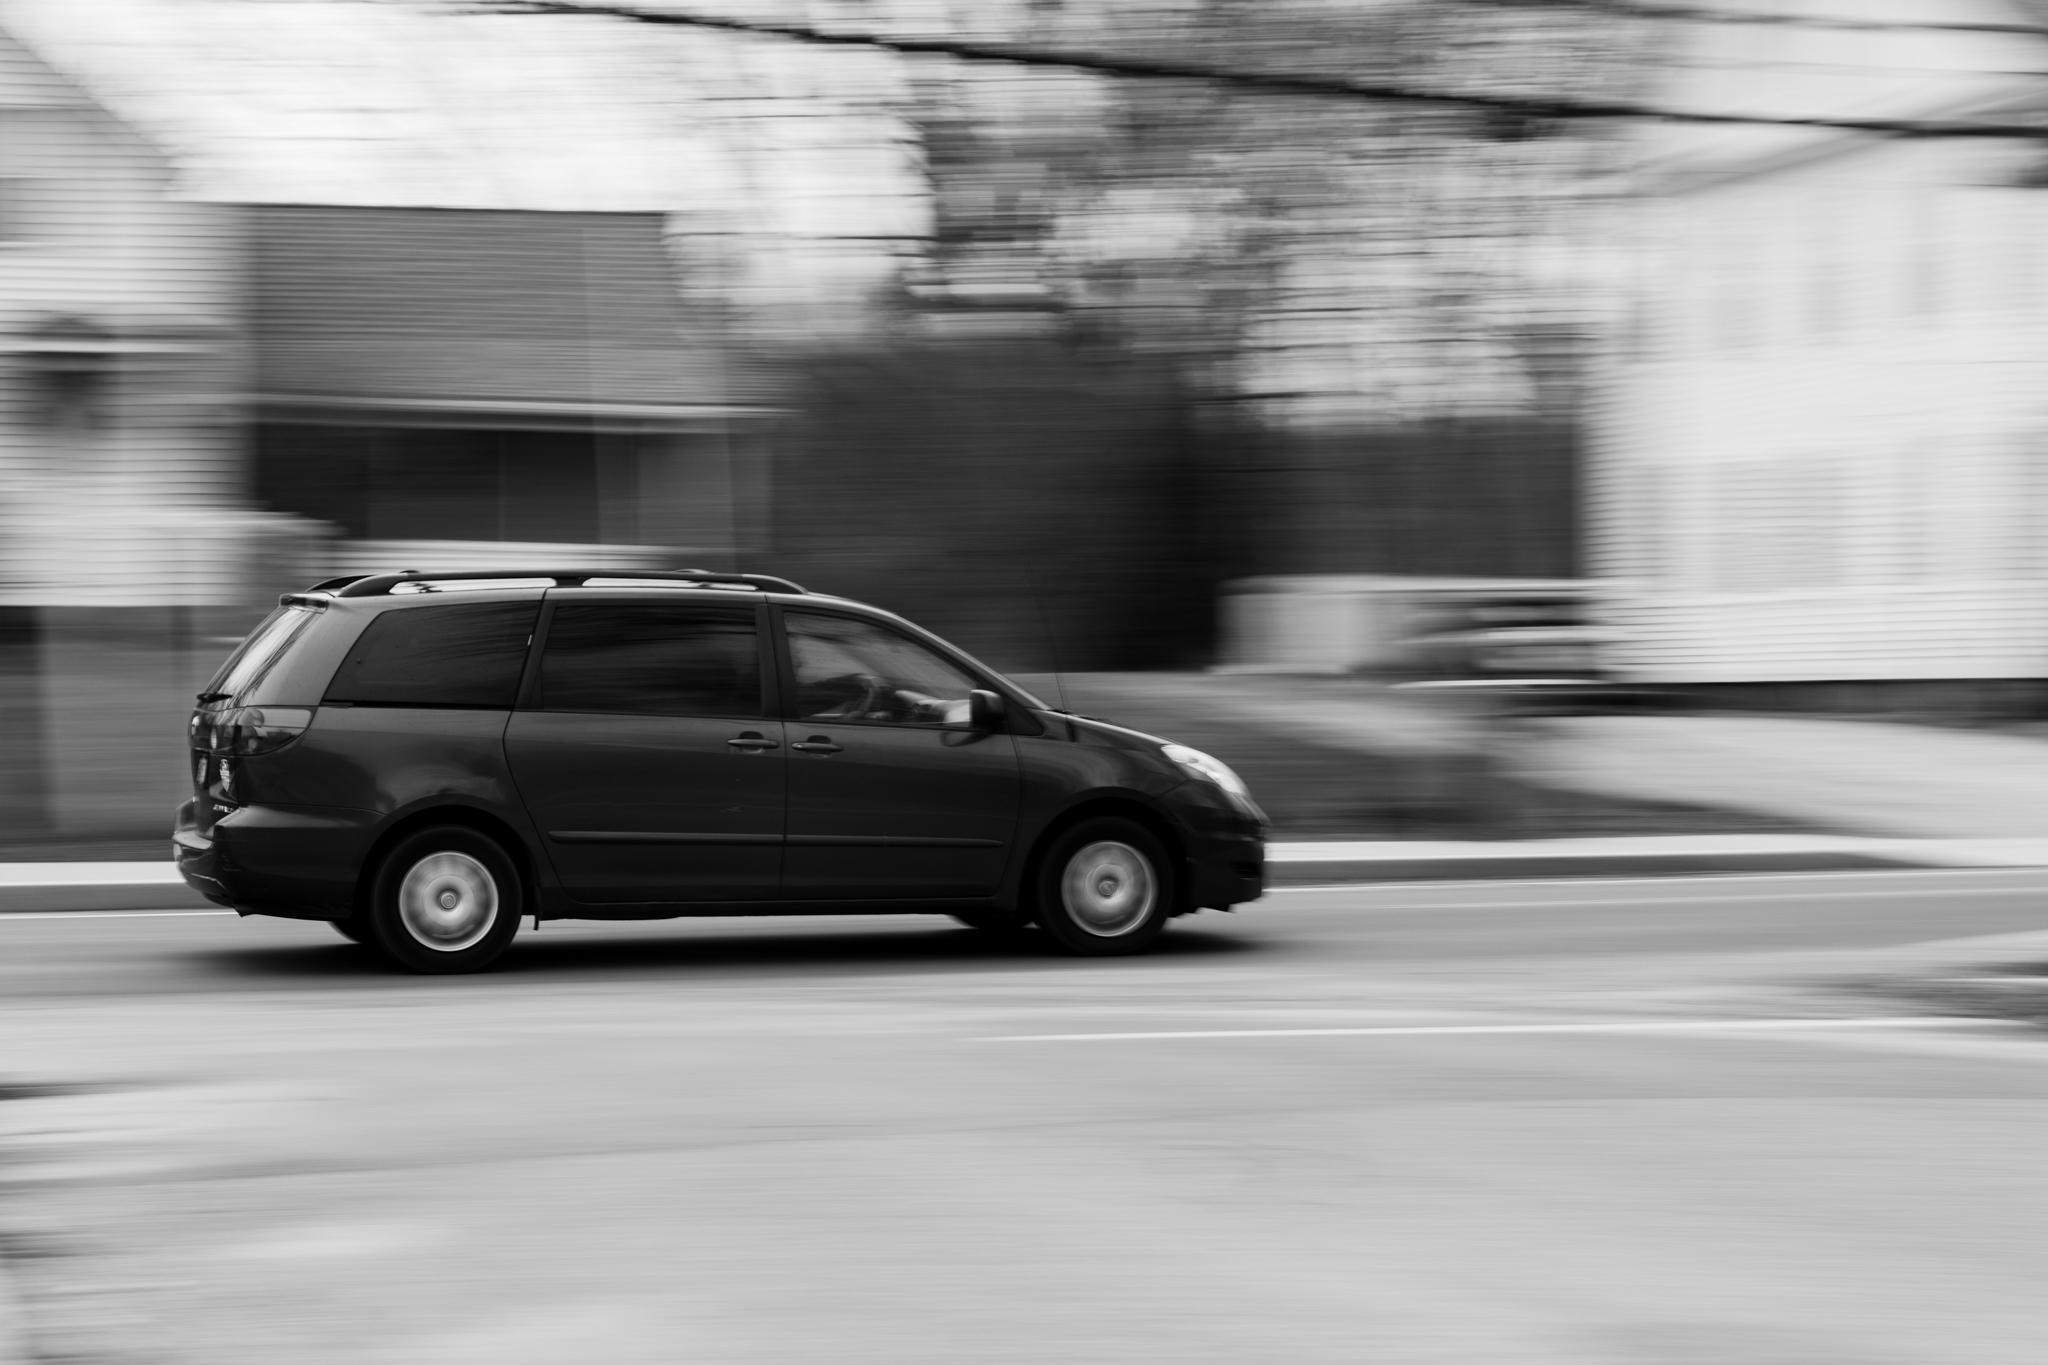 panning image of car in Wakefield, RI